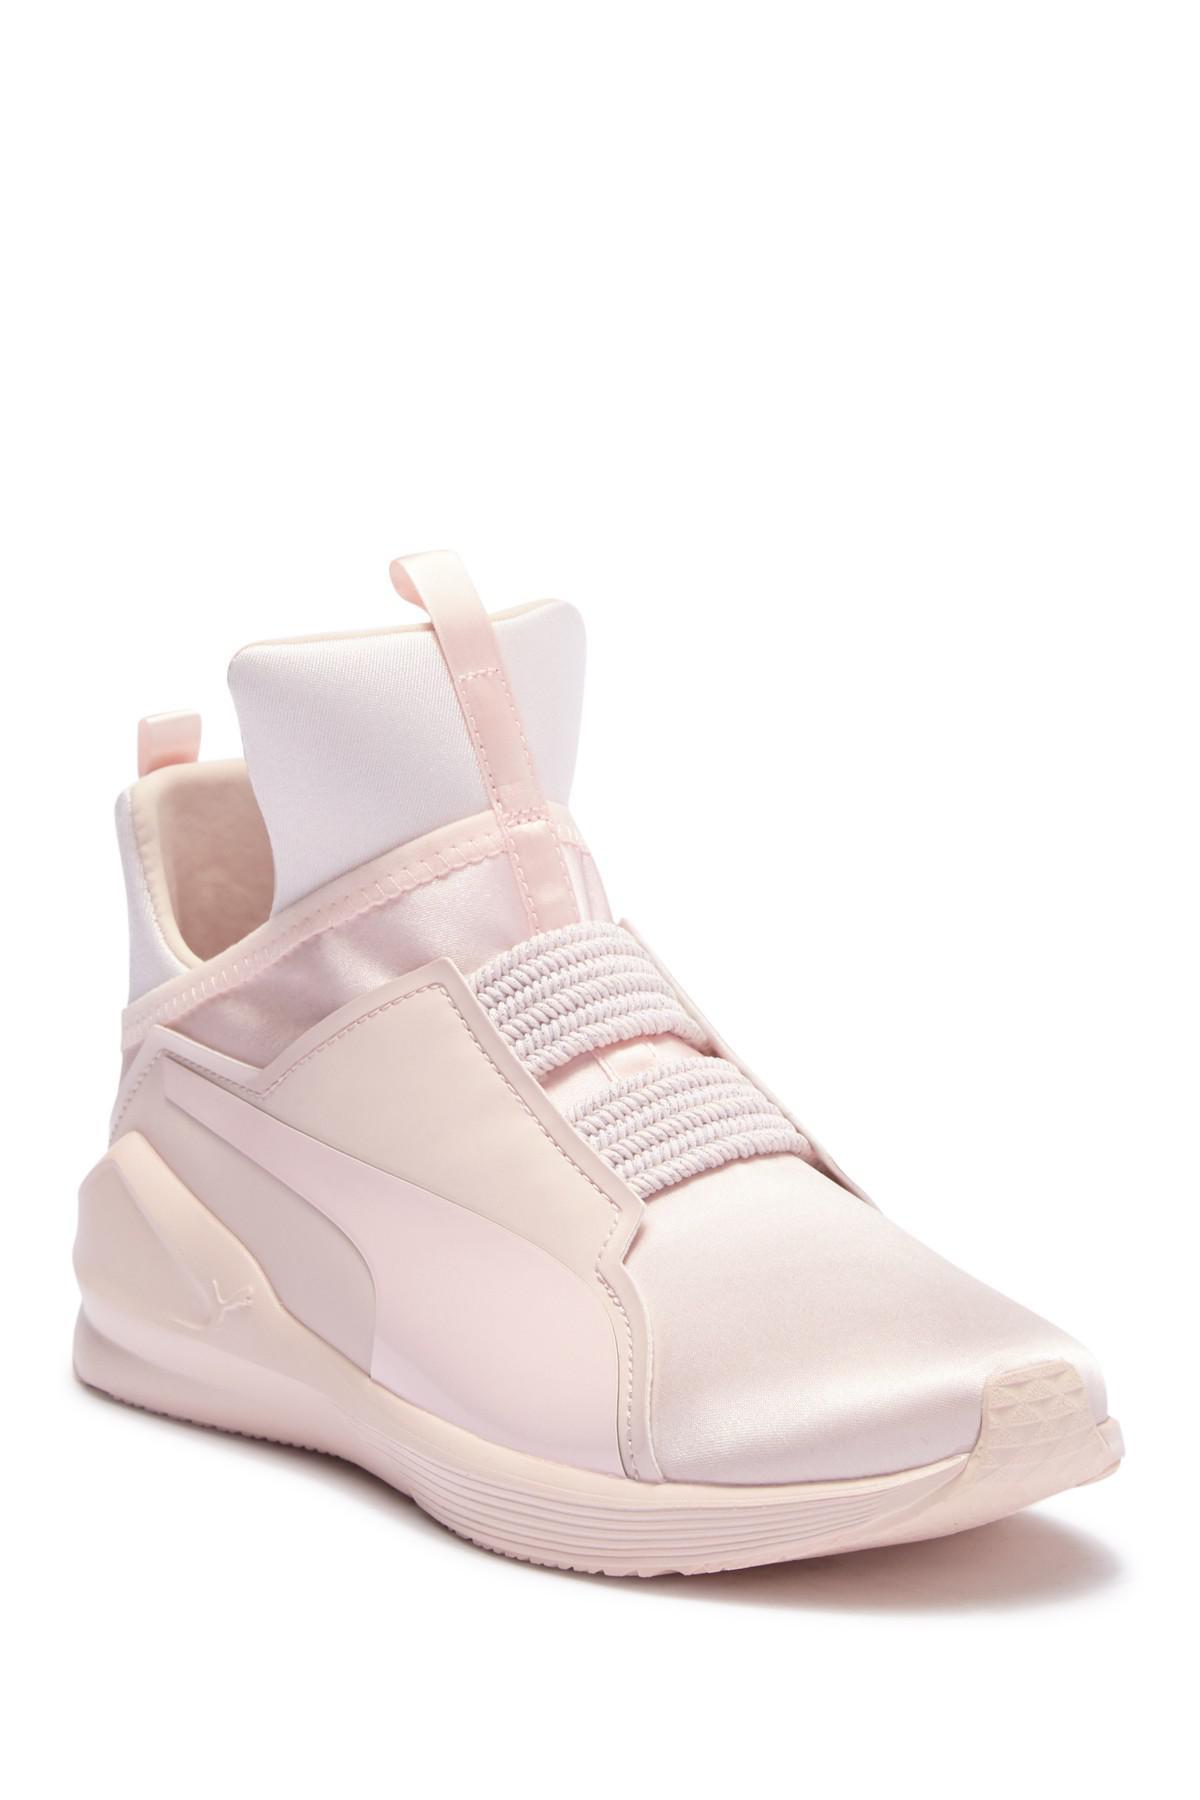 Lyst - PUMA Fierce Satin Ep Training Sneaker in White 32a1cdf6d